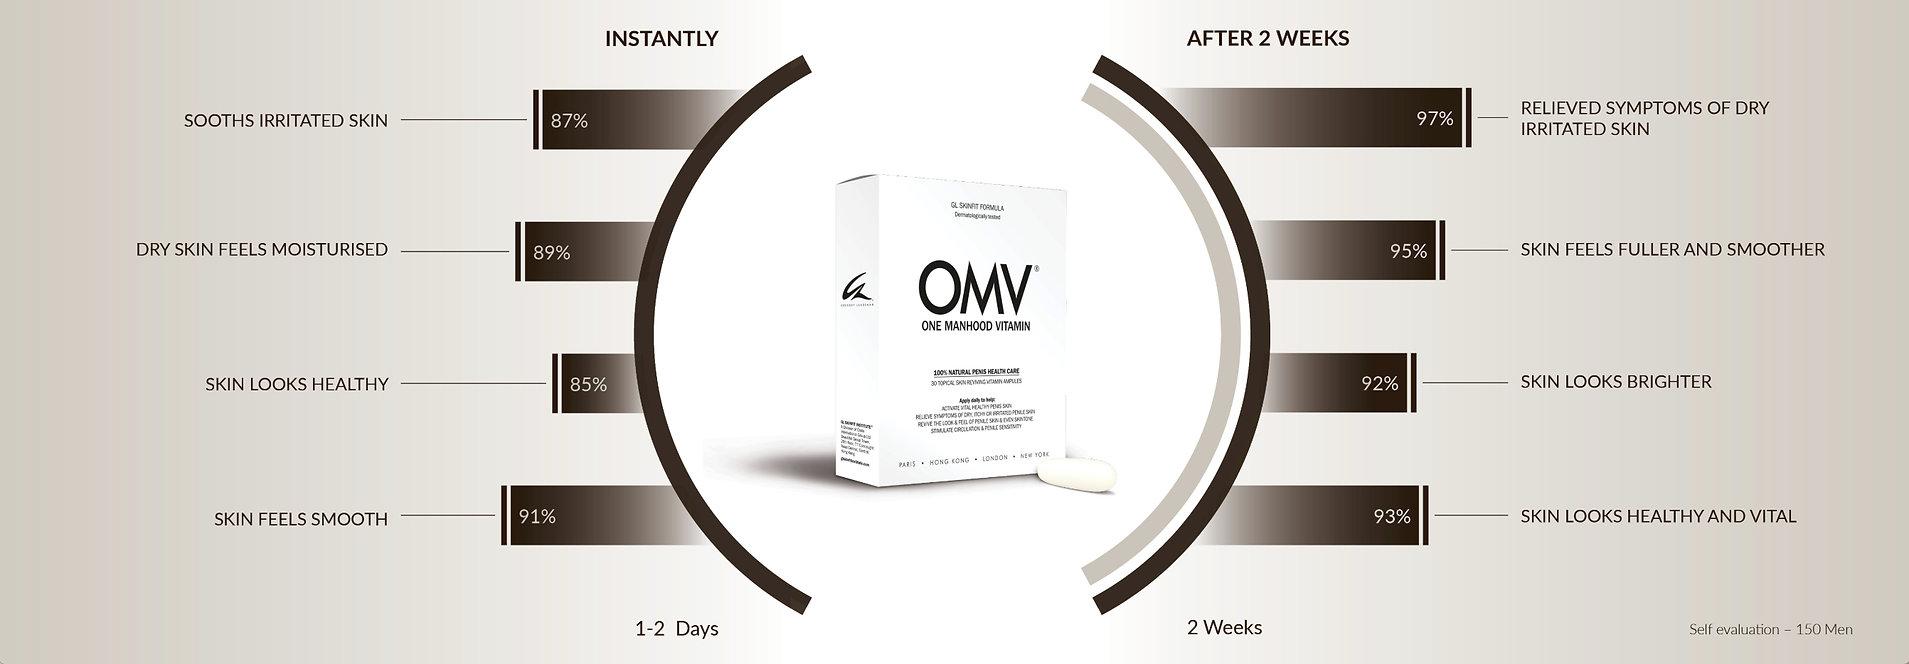 OMV - One Manhood Vitamin - Men's resear